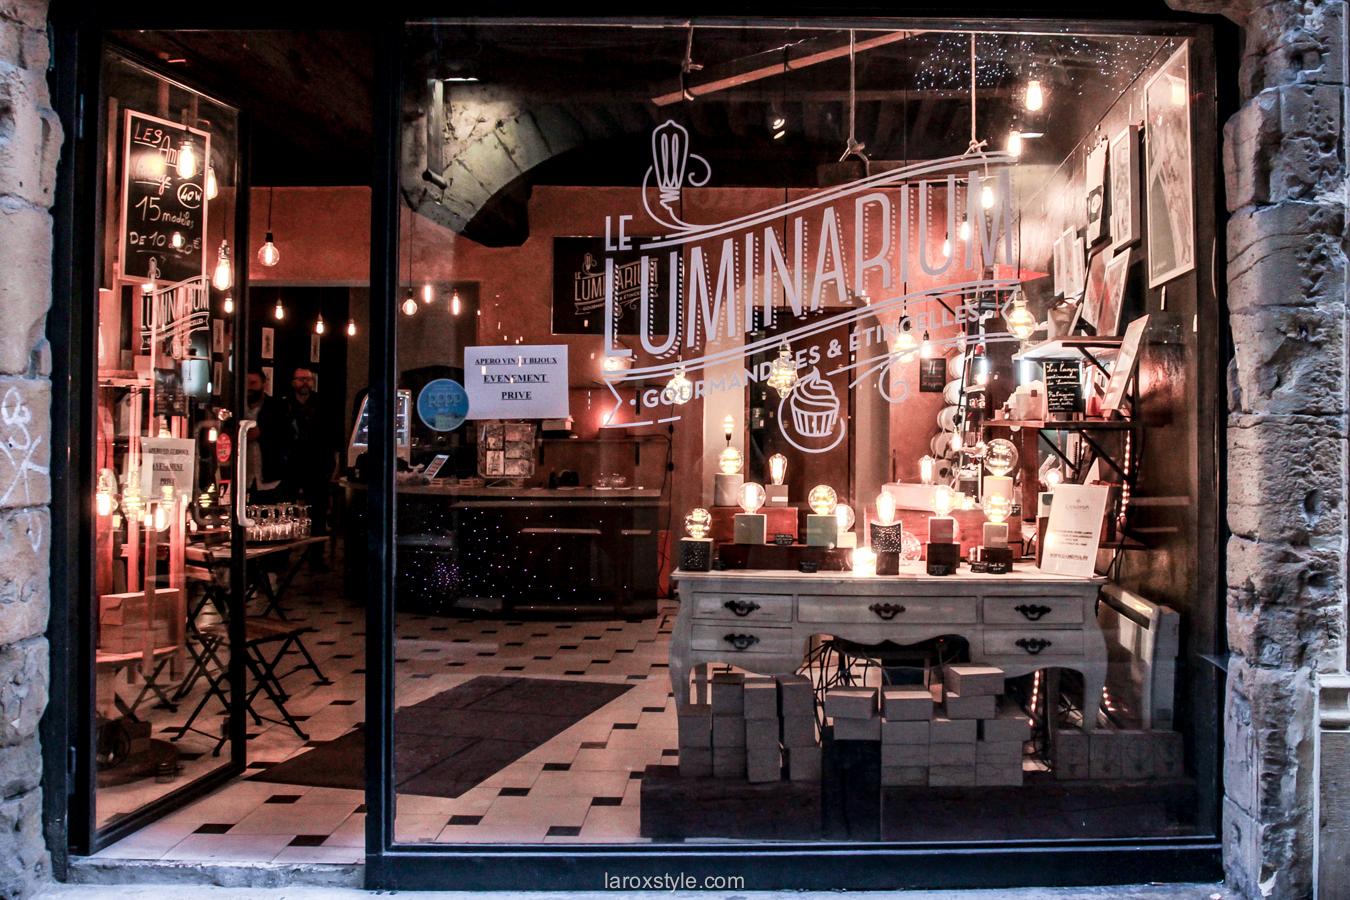 le luminarium lyon - gouter lyon - coffee shop lyon - laroxstyle blog lifestyle